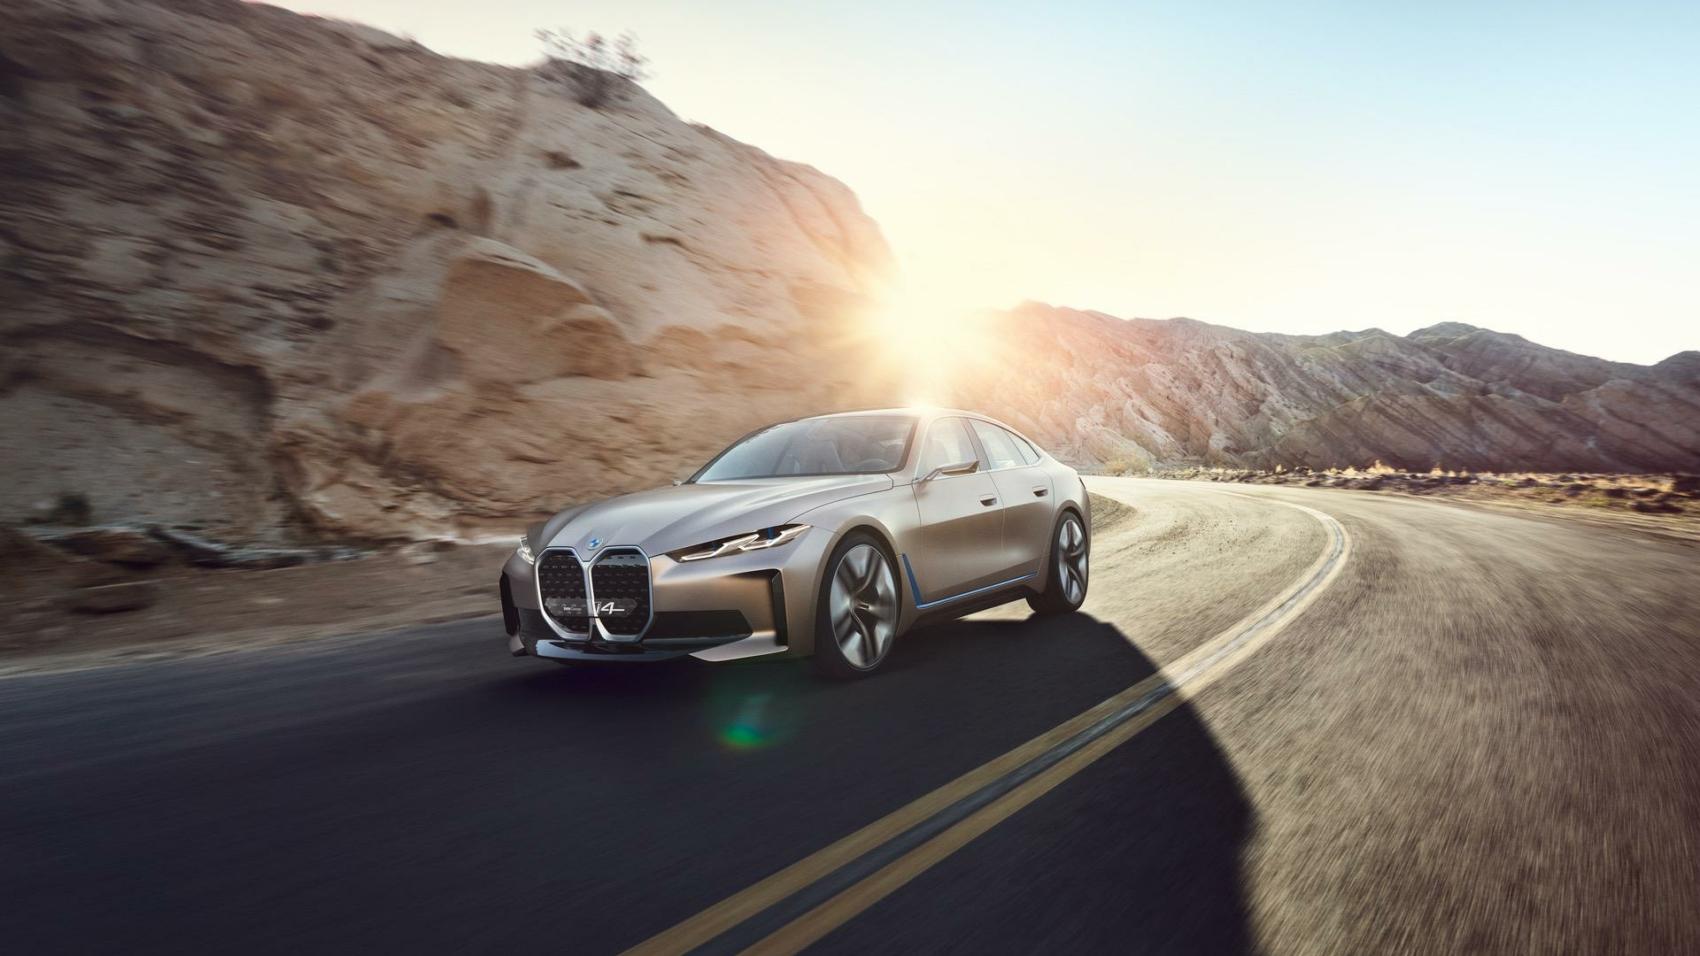 BMW-Concept-i4-images-02